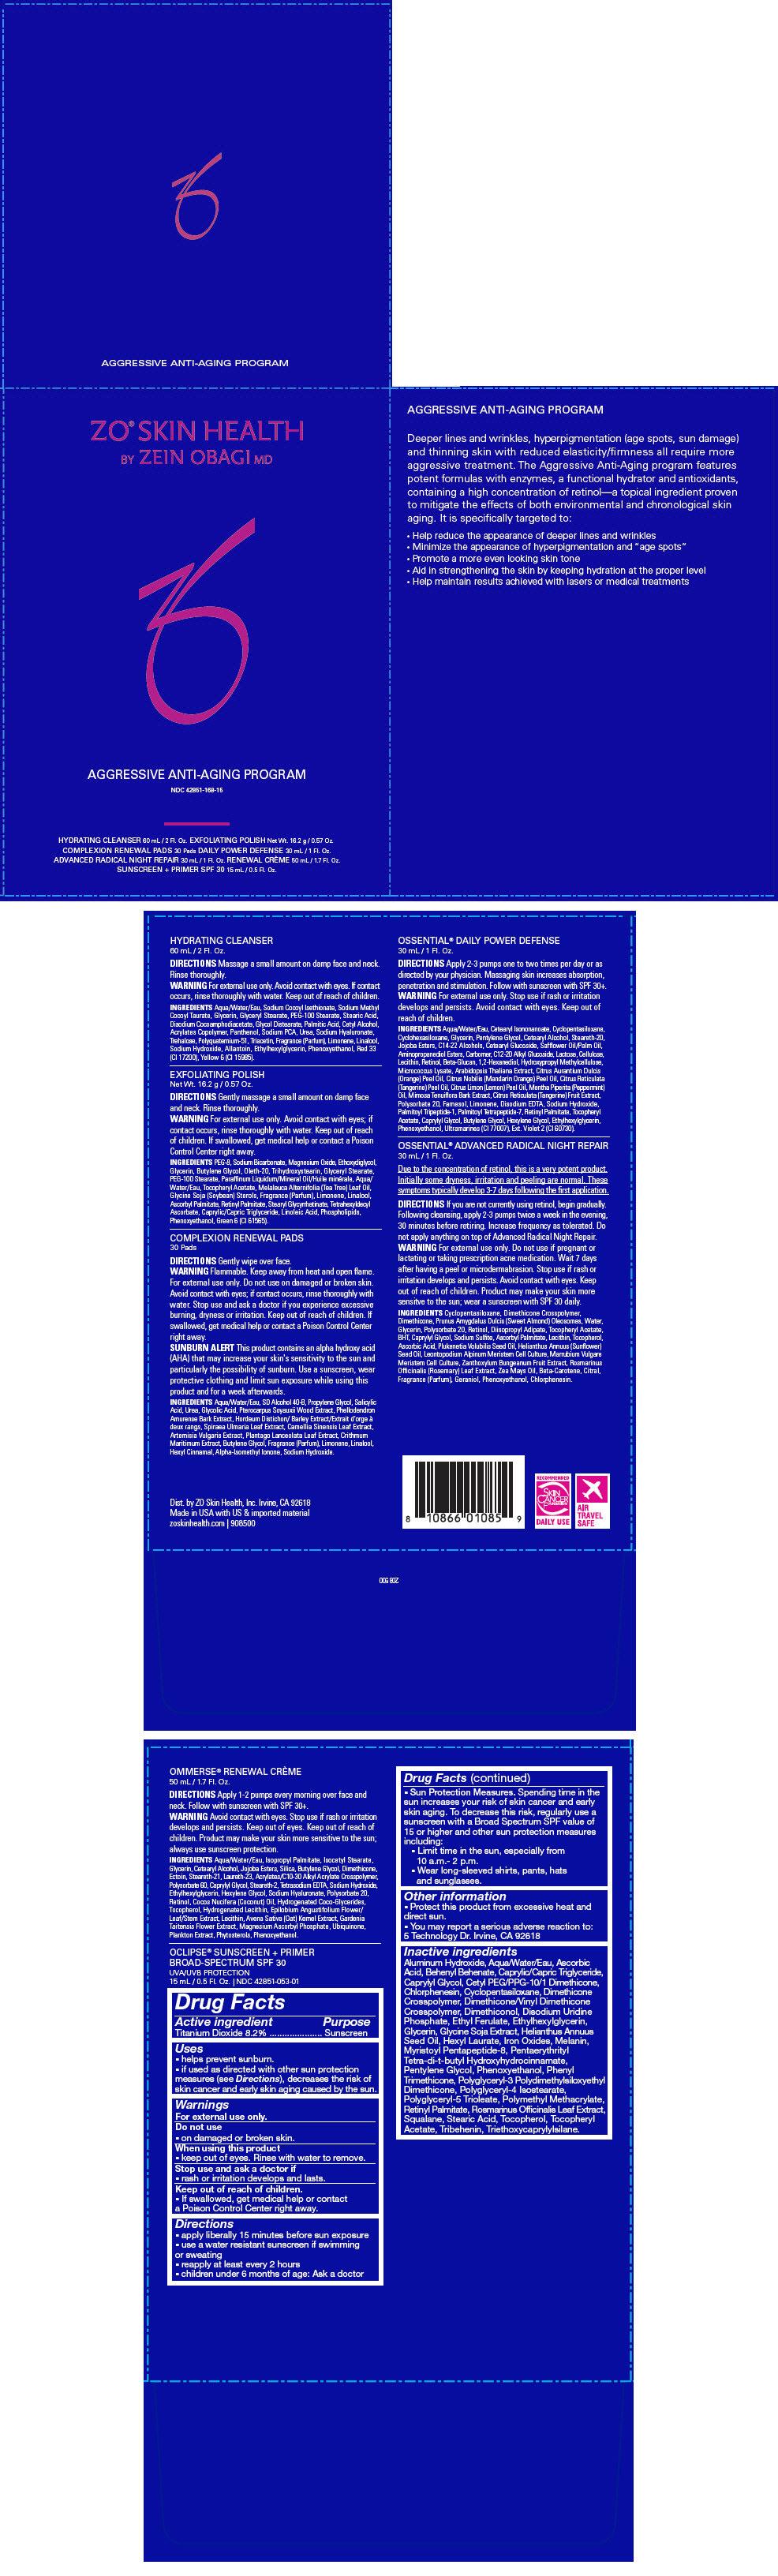 Zo Skin Health Aggressive Anti-aging Program   Titanium Dioxide Kit while Breastfeeding